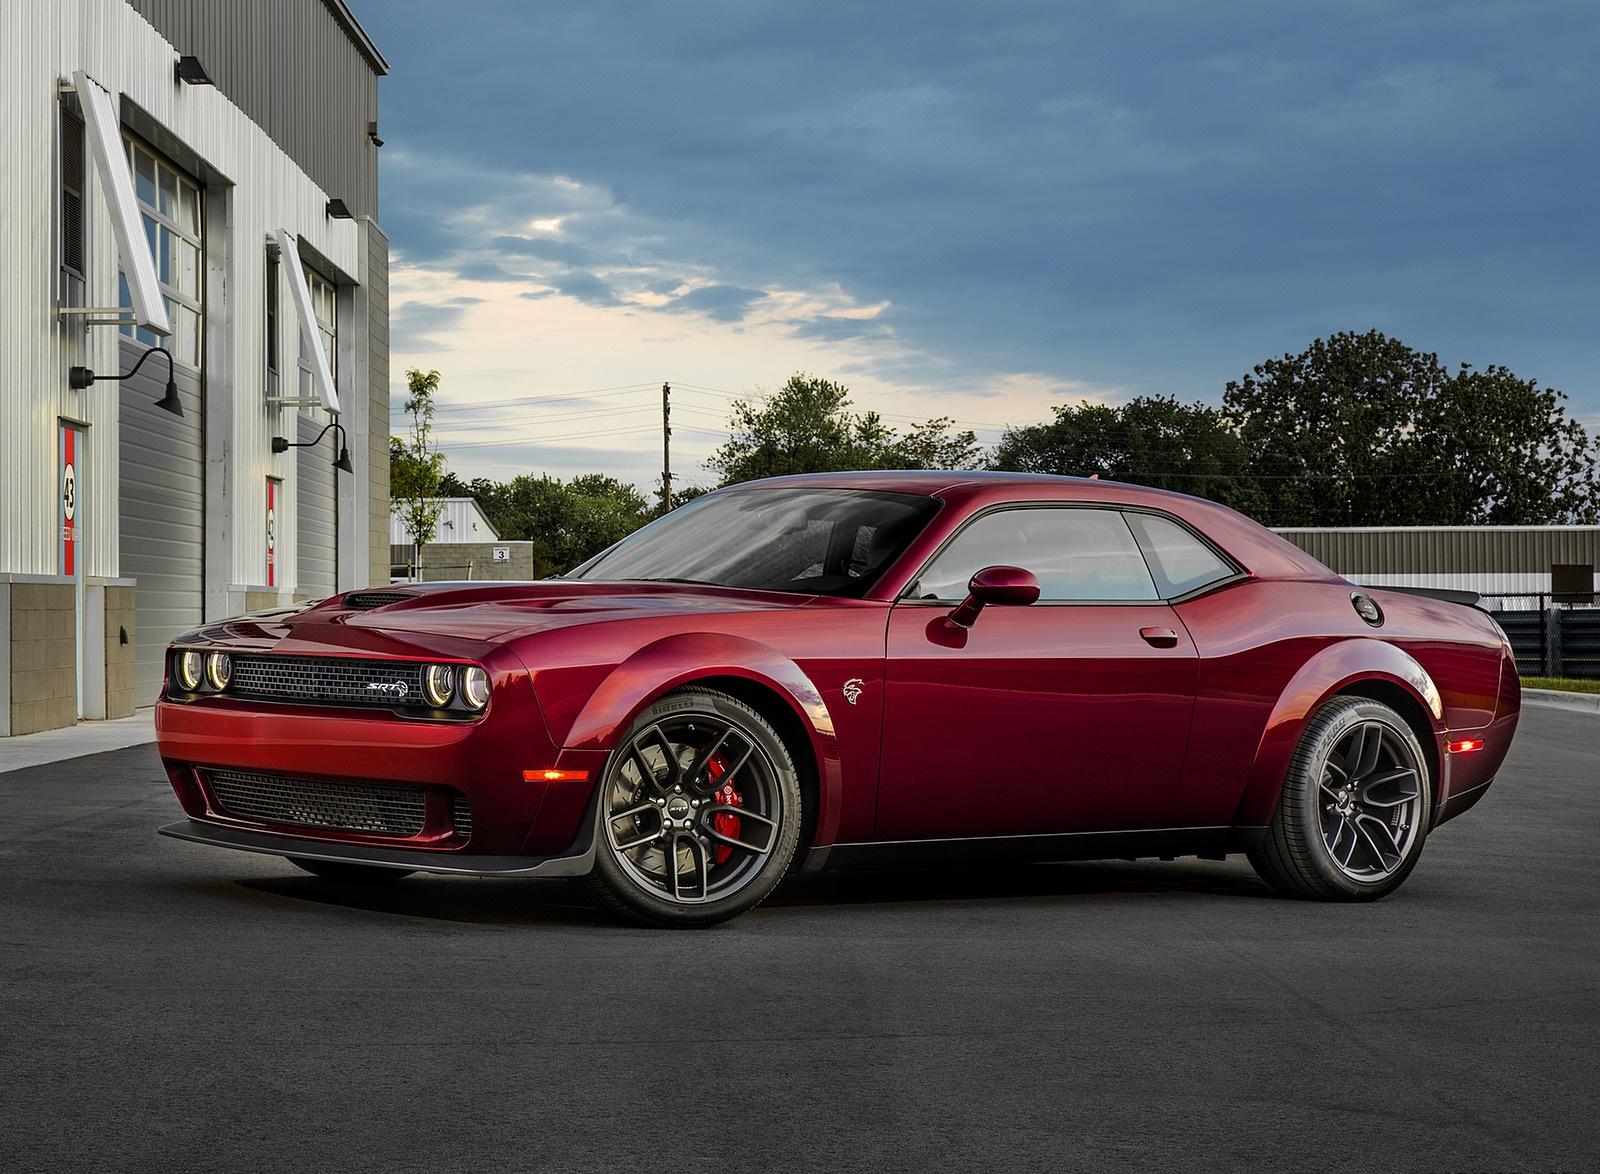 2018 Dodge Challenger SRT Hellcat Widebody Front Three-Quarter Wallpaper (9)